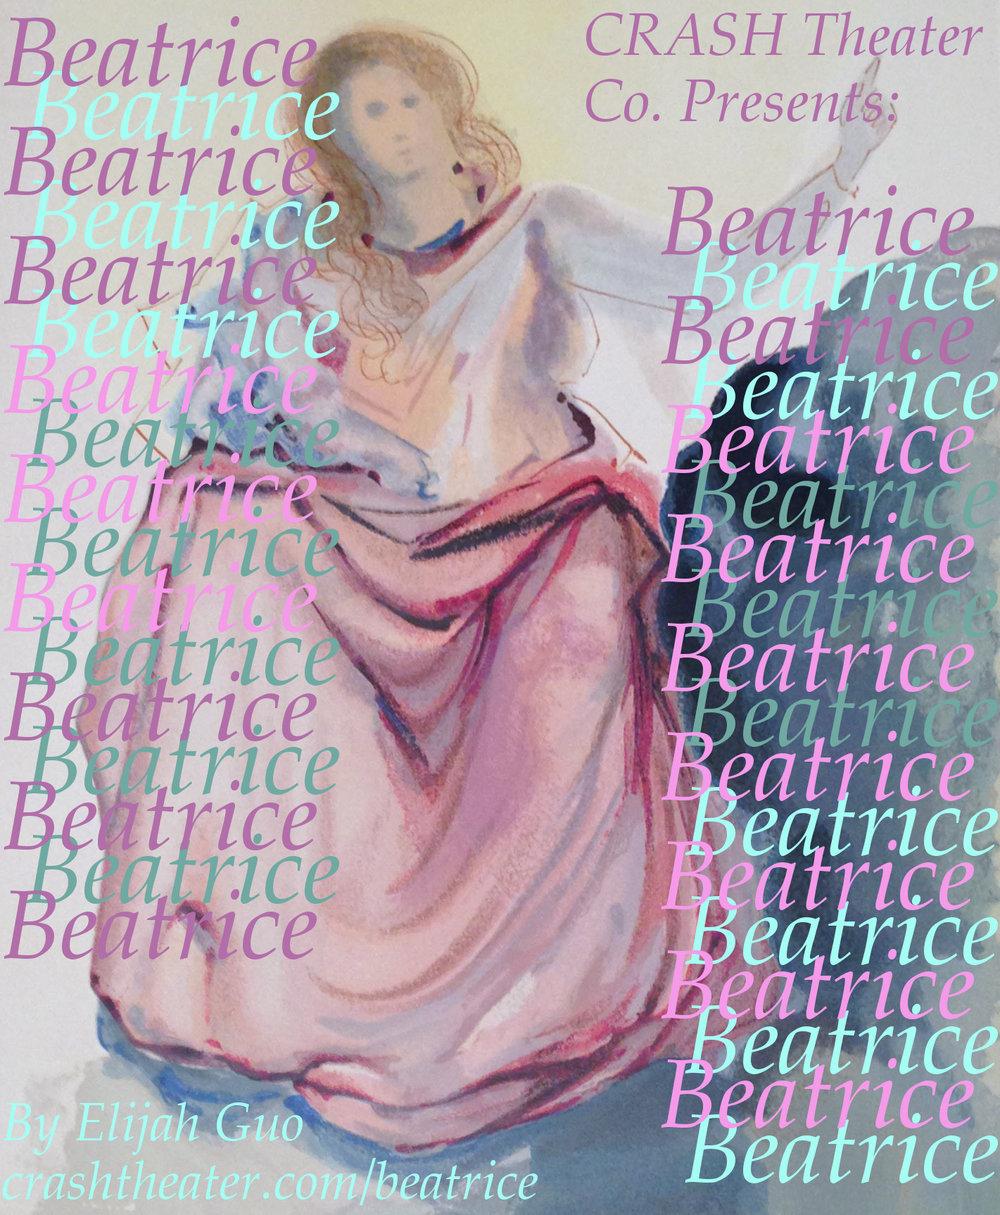 beatrice poster.jpg